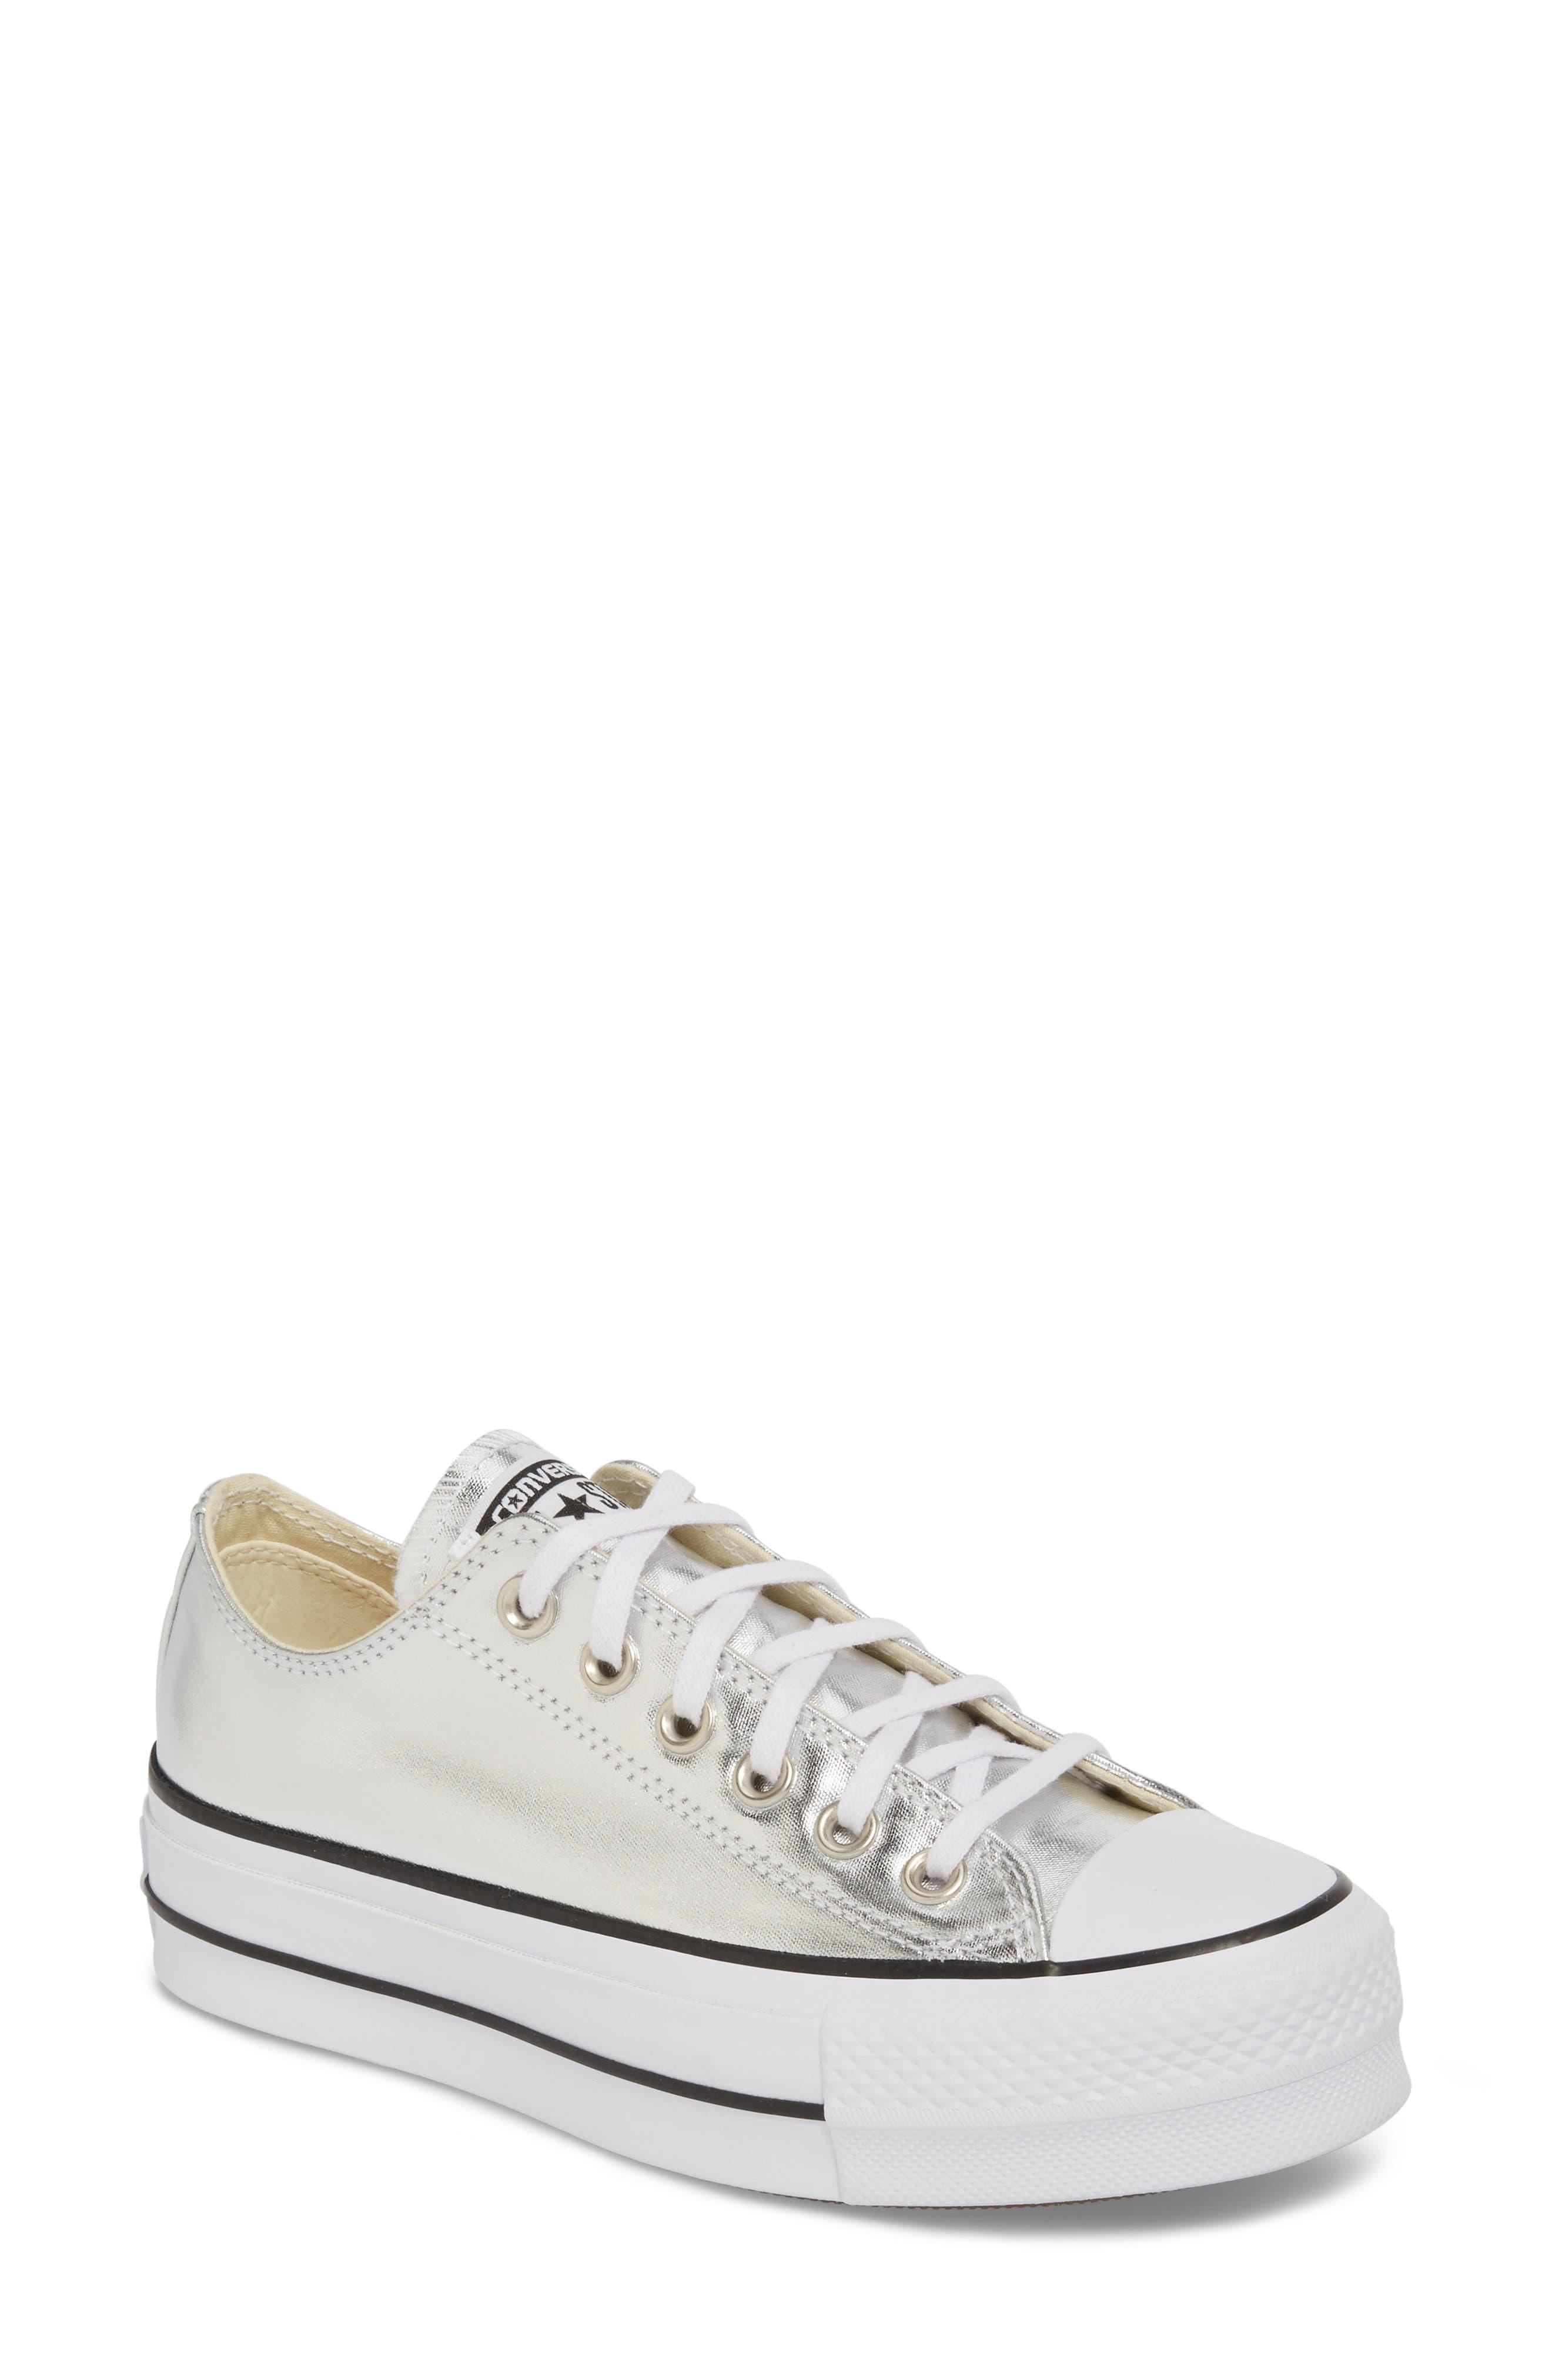 Chuck Taylor<sup>®</sup> All Star Platform Sneaker,                             Main thumbnail 1, color,                             Silver/ Black